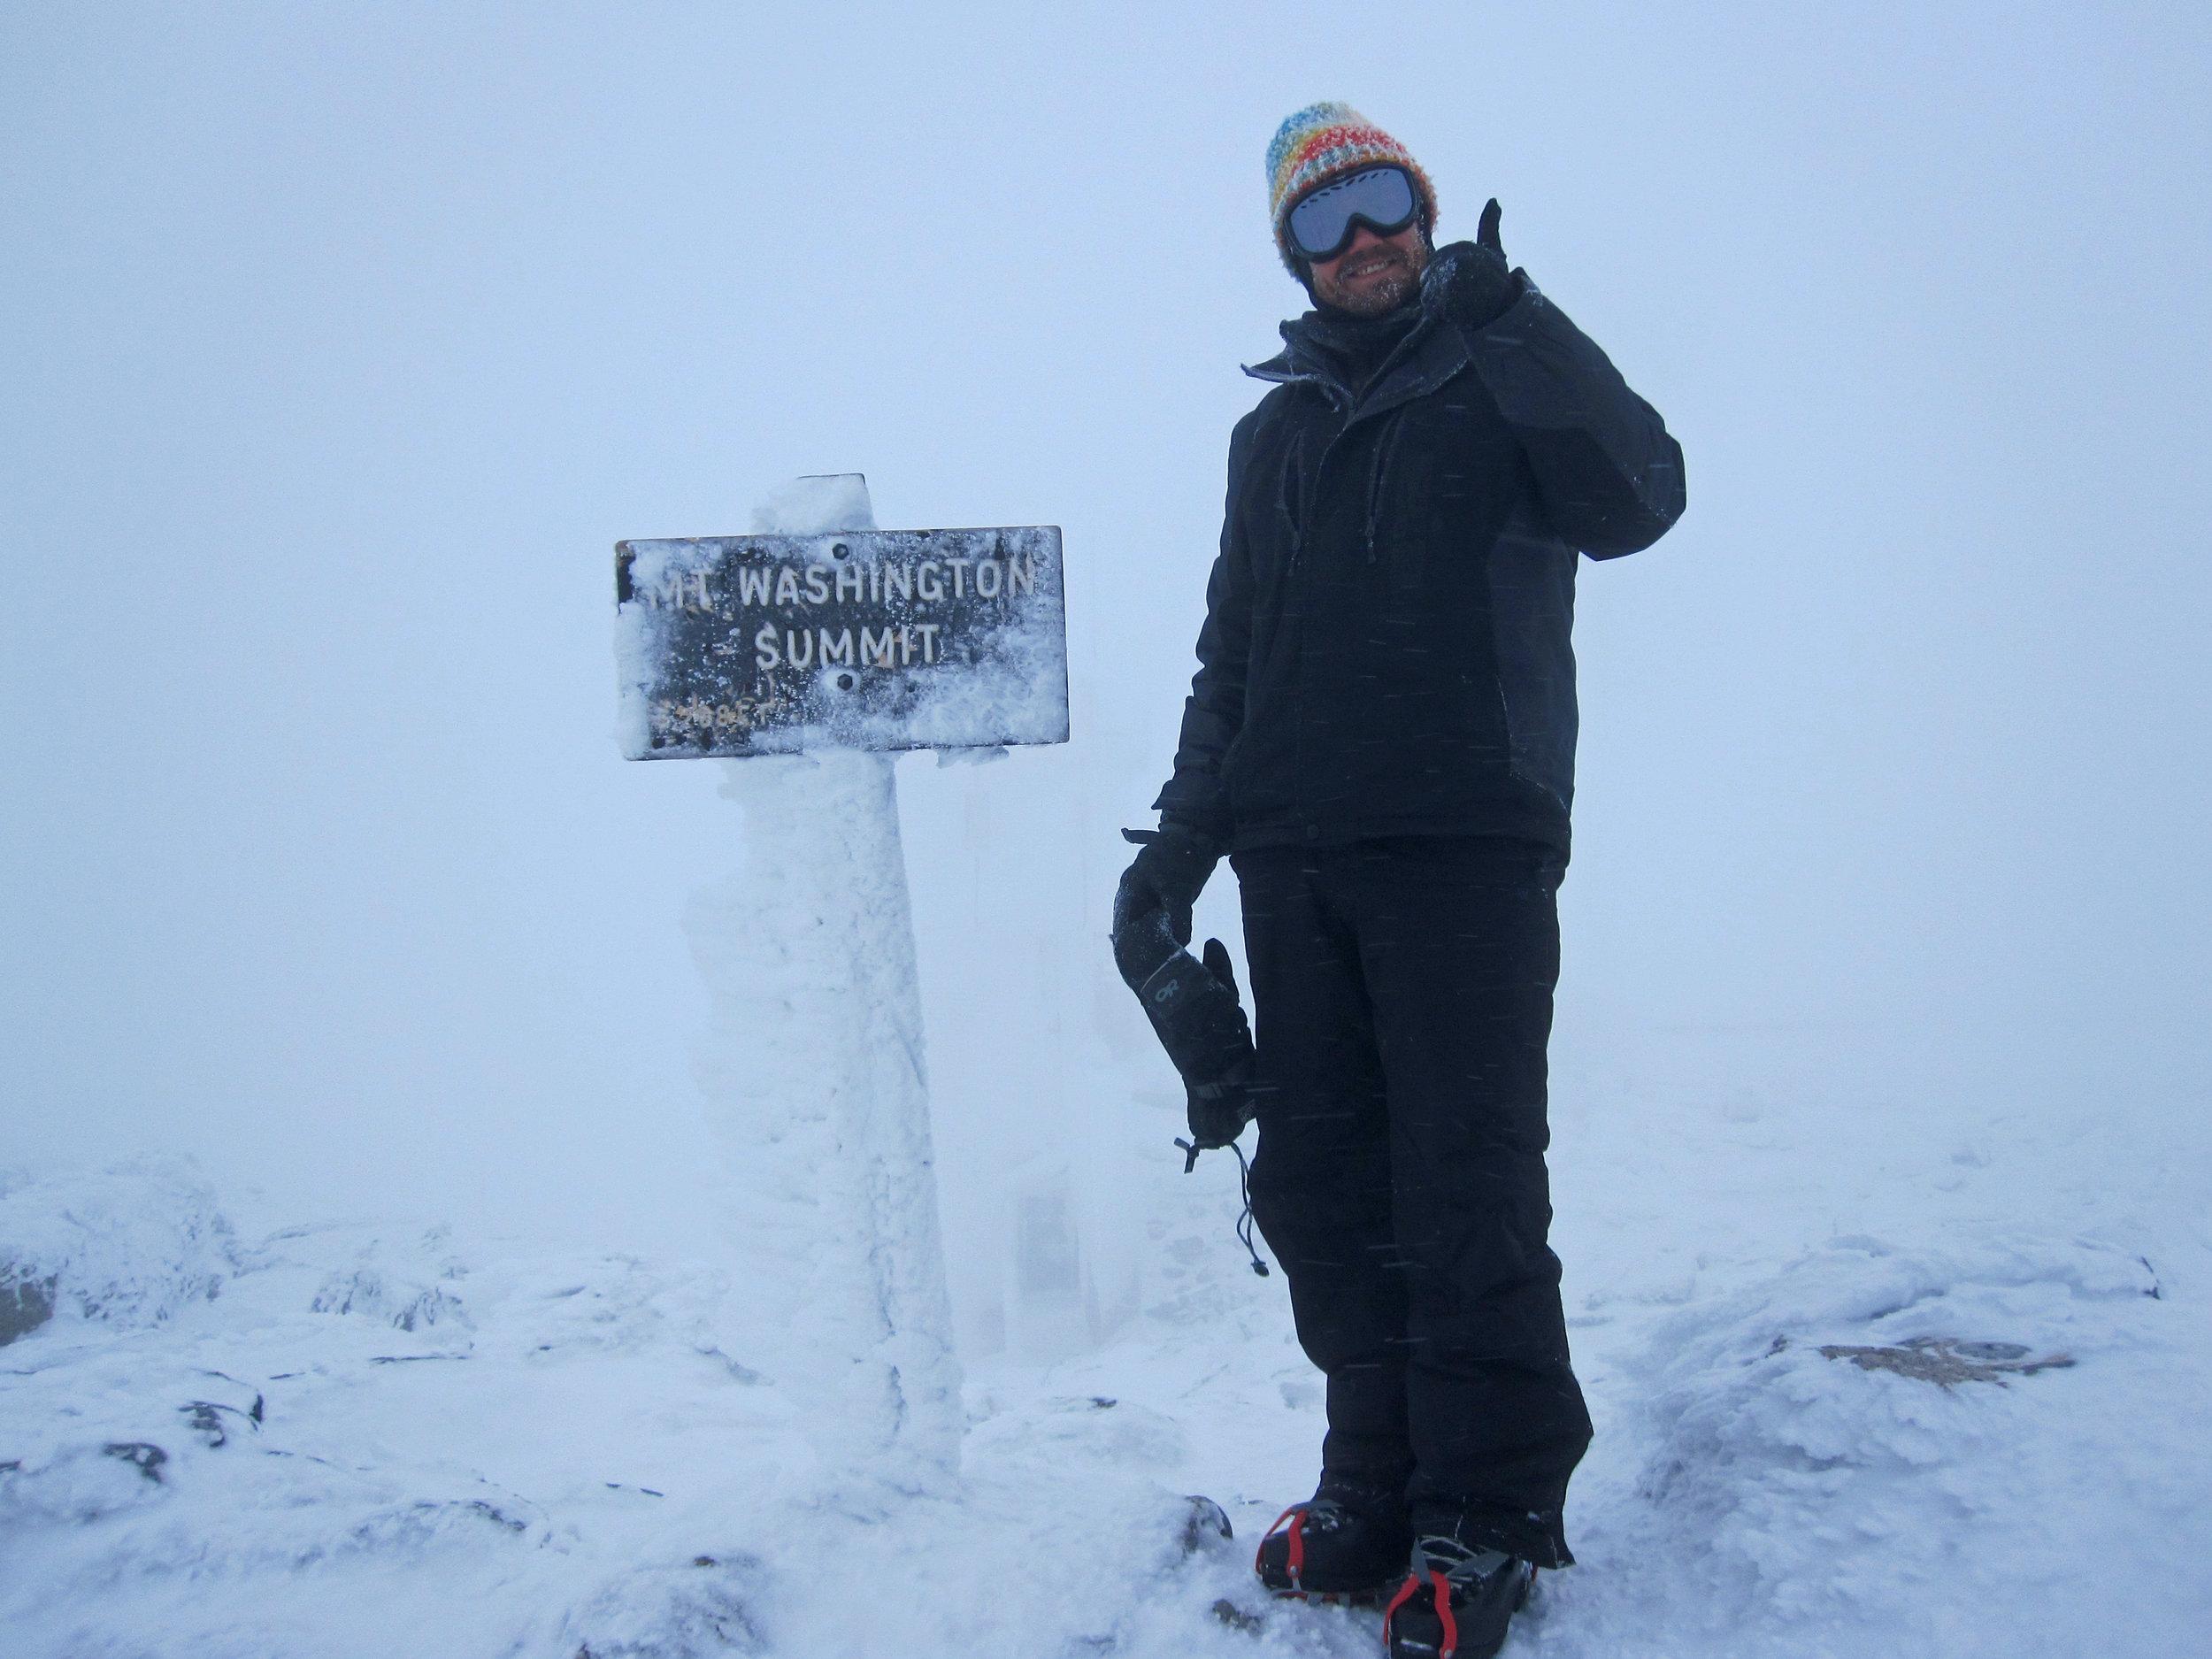 Foggy summit of Mount Washington in the winter